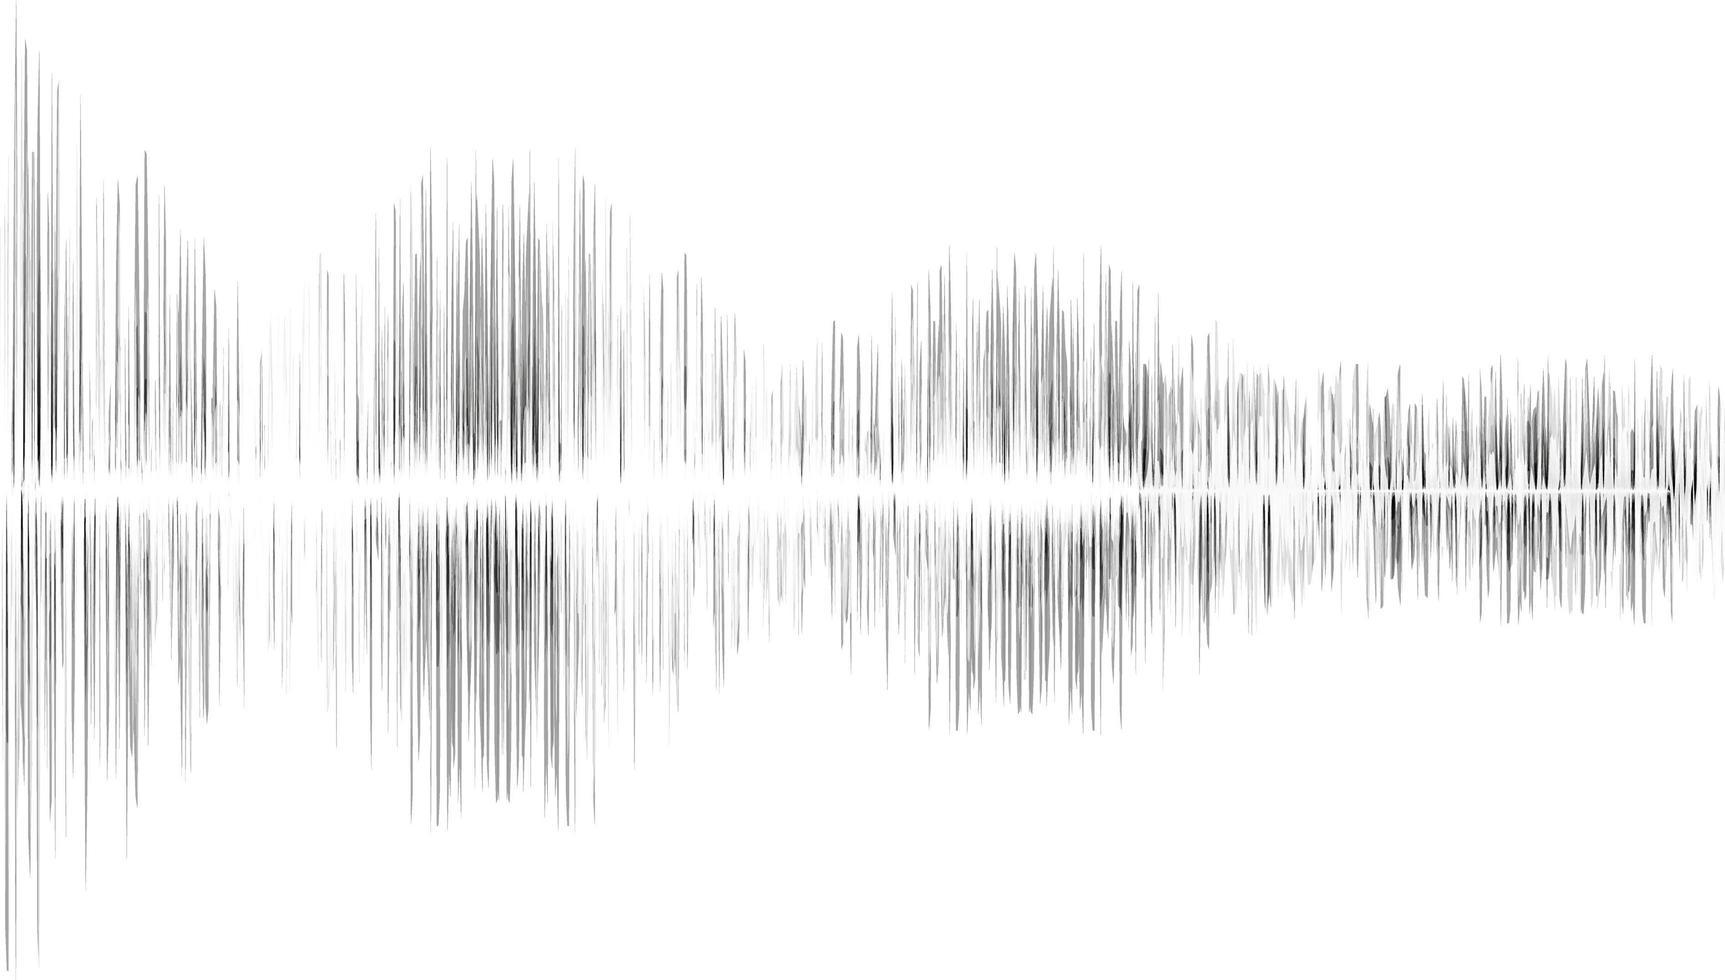 oskärpa svart ljudvåg bakgrund vektor